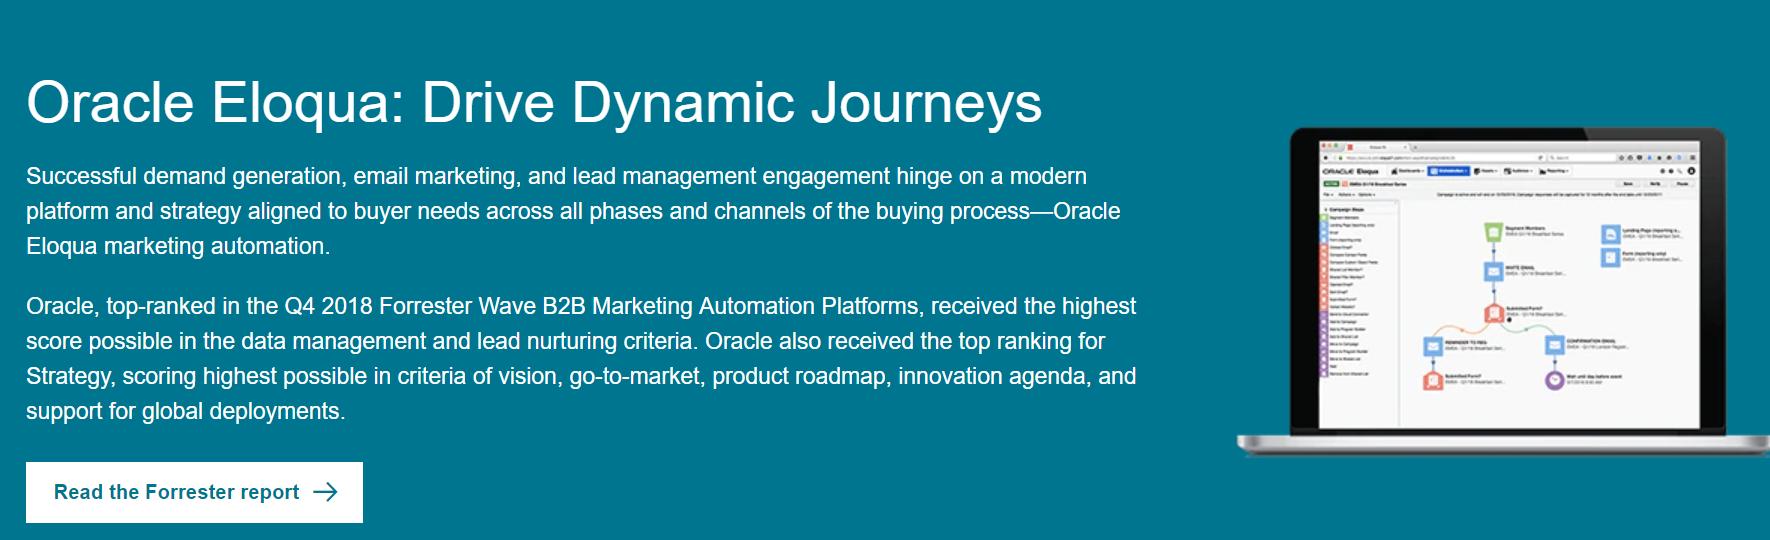 Oracle Eloqua: Marketing automation tool